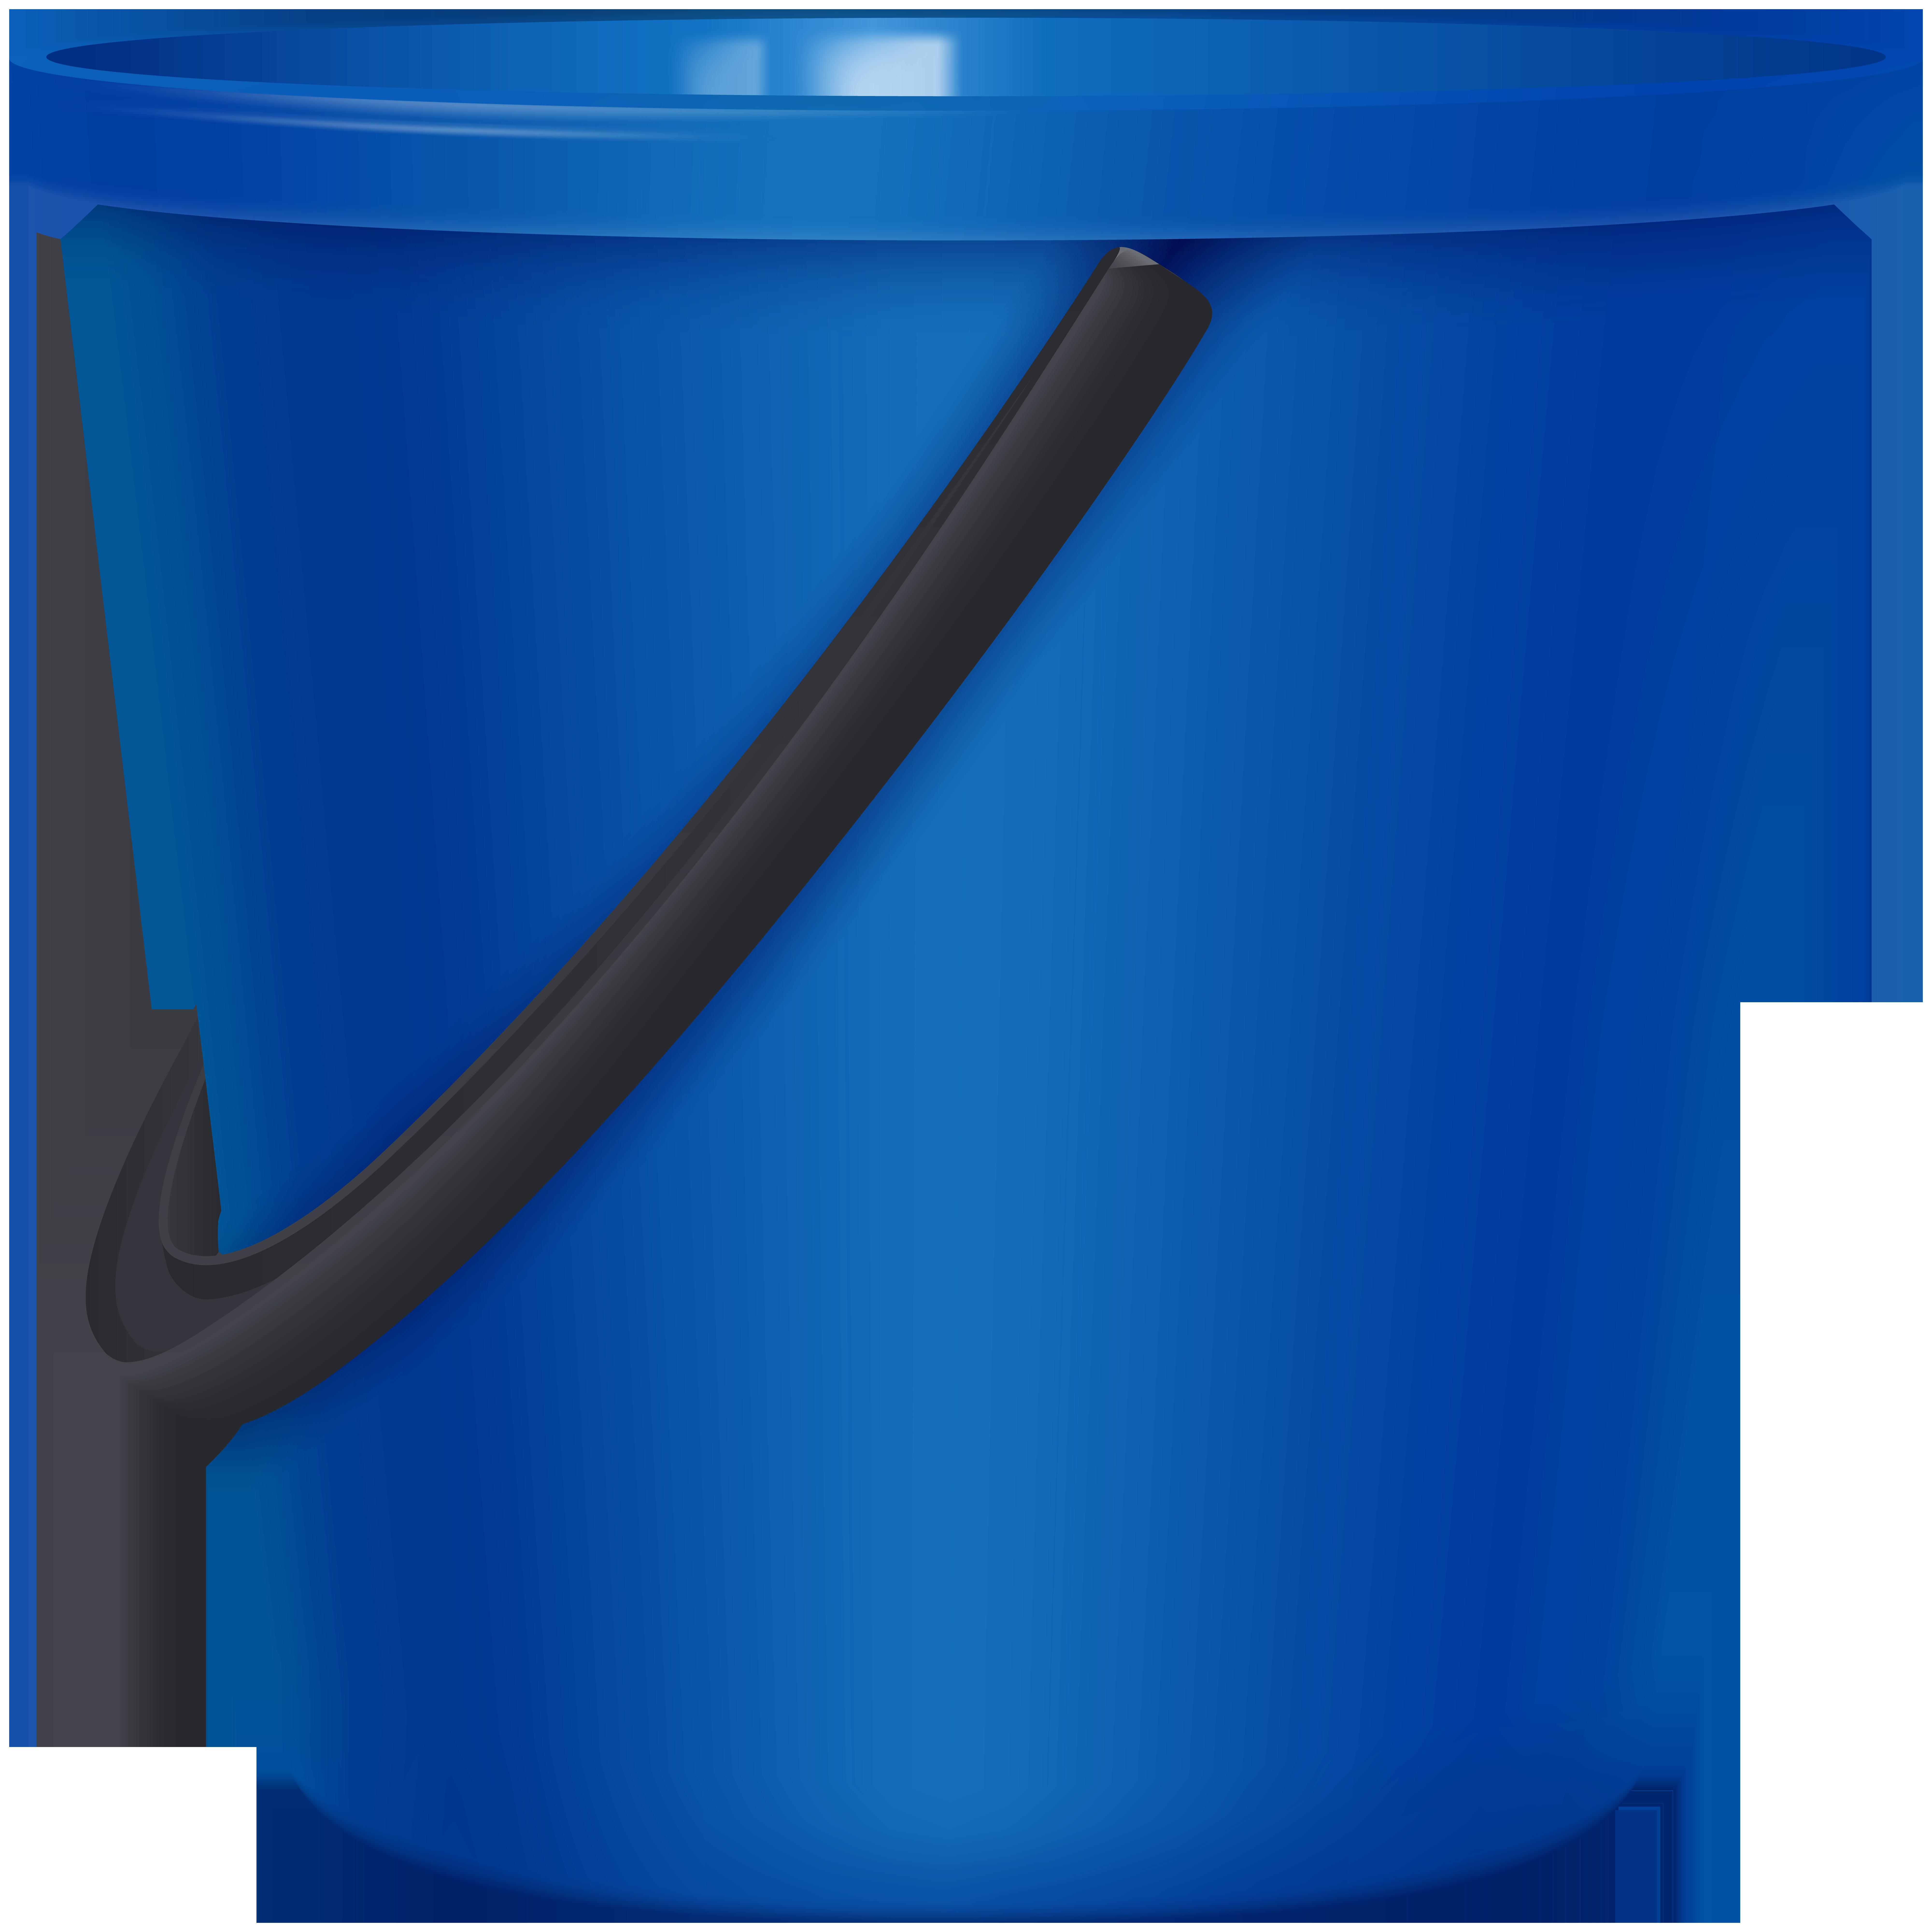 Blue Bucket PNG Clip Art.